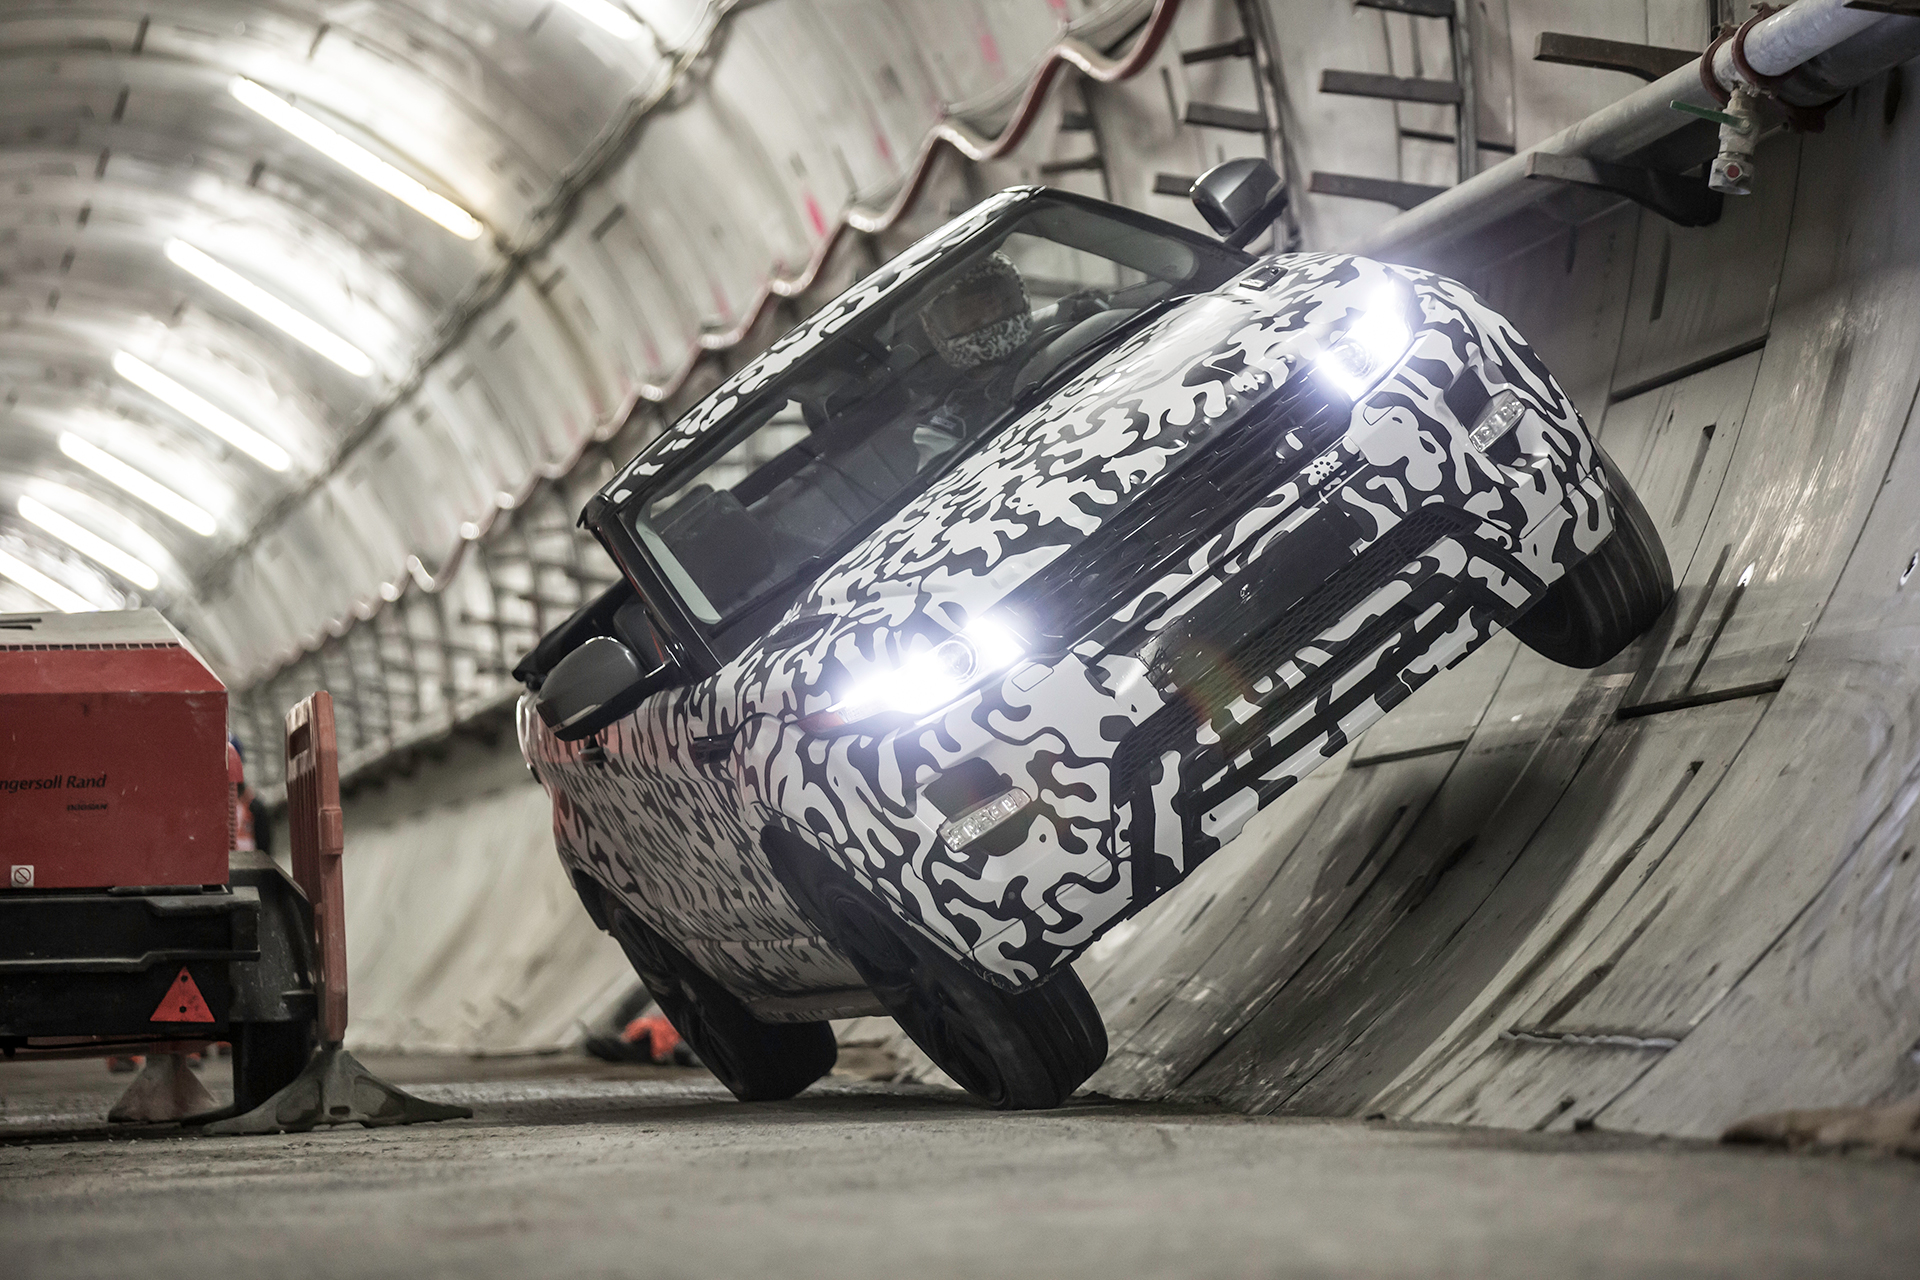 Land Rover Range Rover Evoque Convertible - avant / front - teaser underground